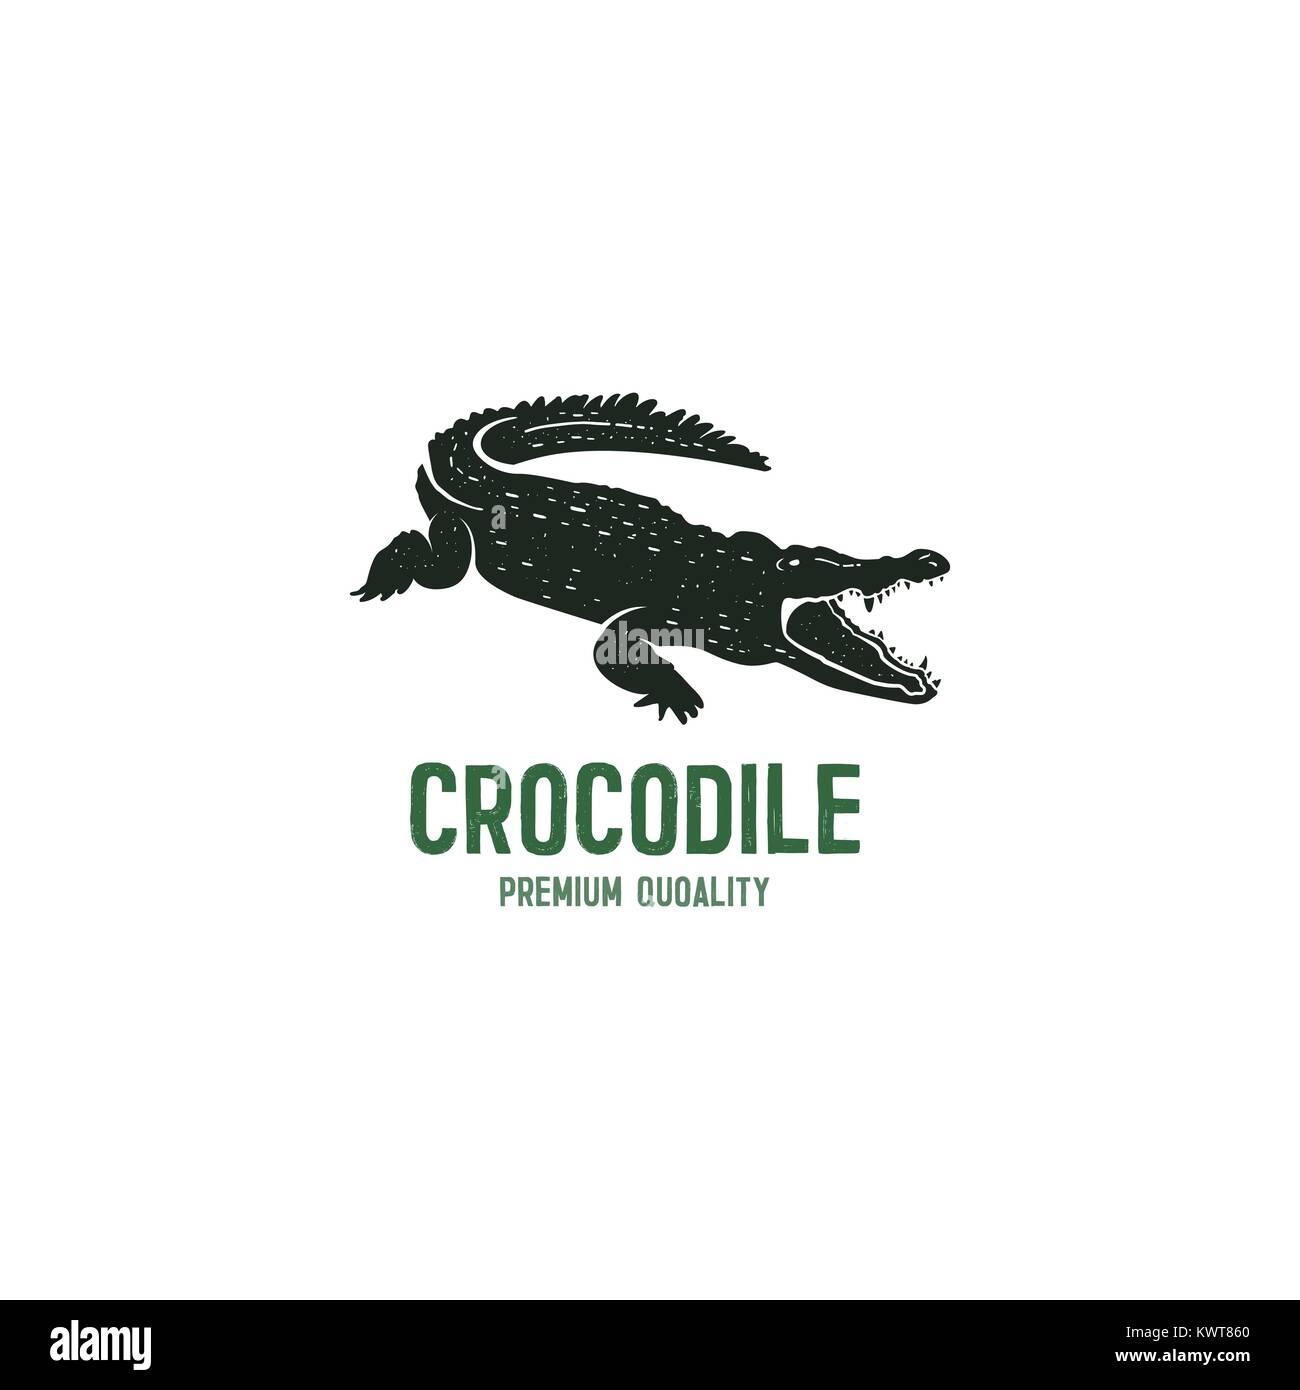 crocodile logo template symbol of alligator crocodile with text